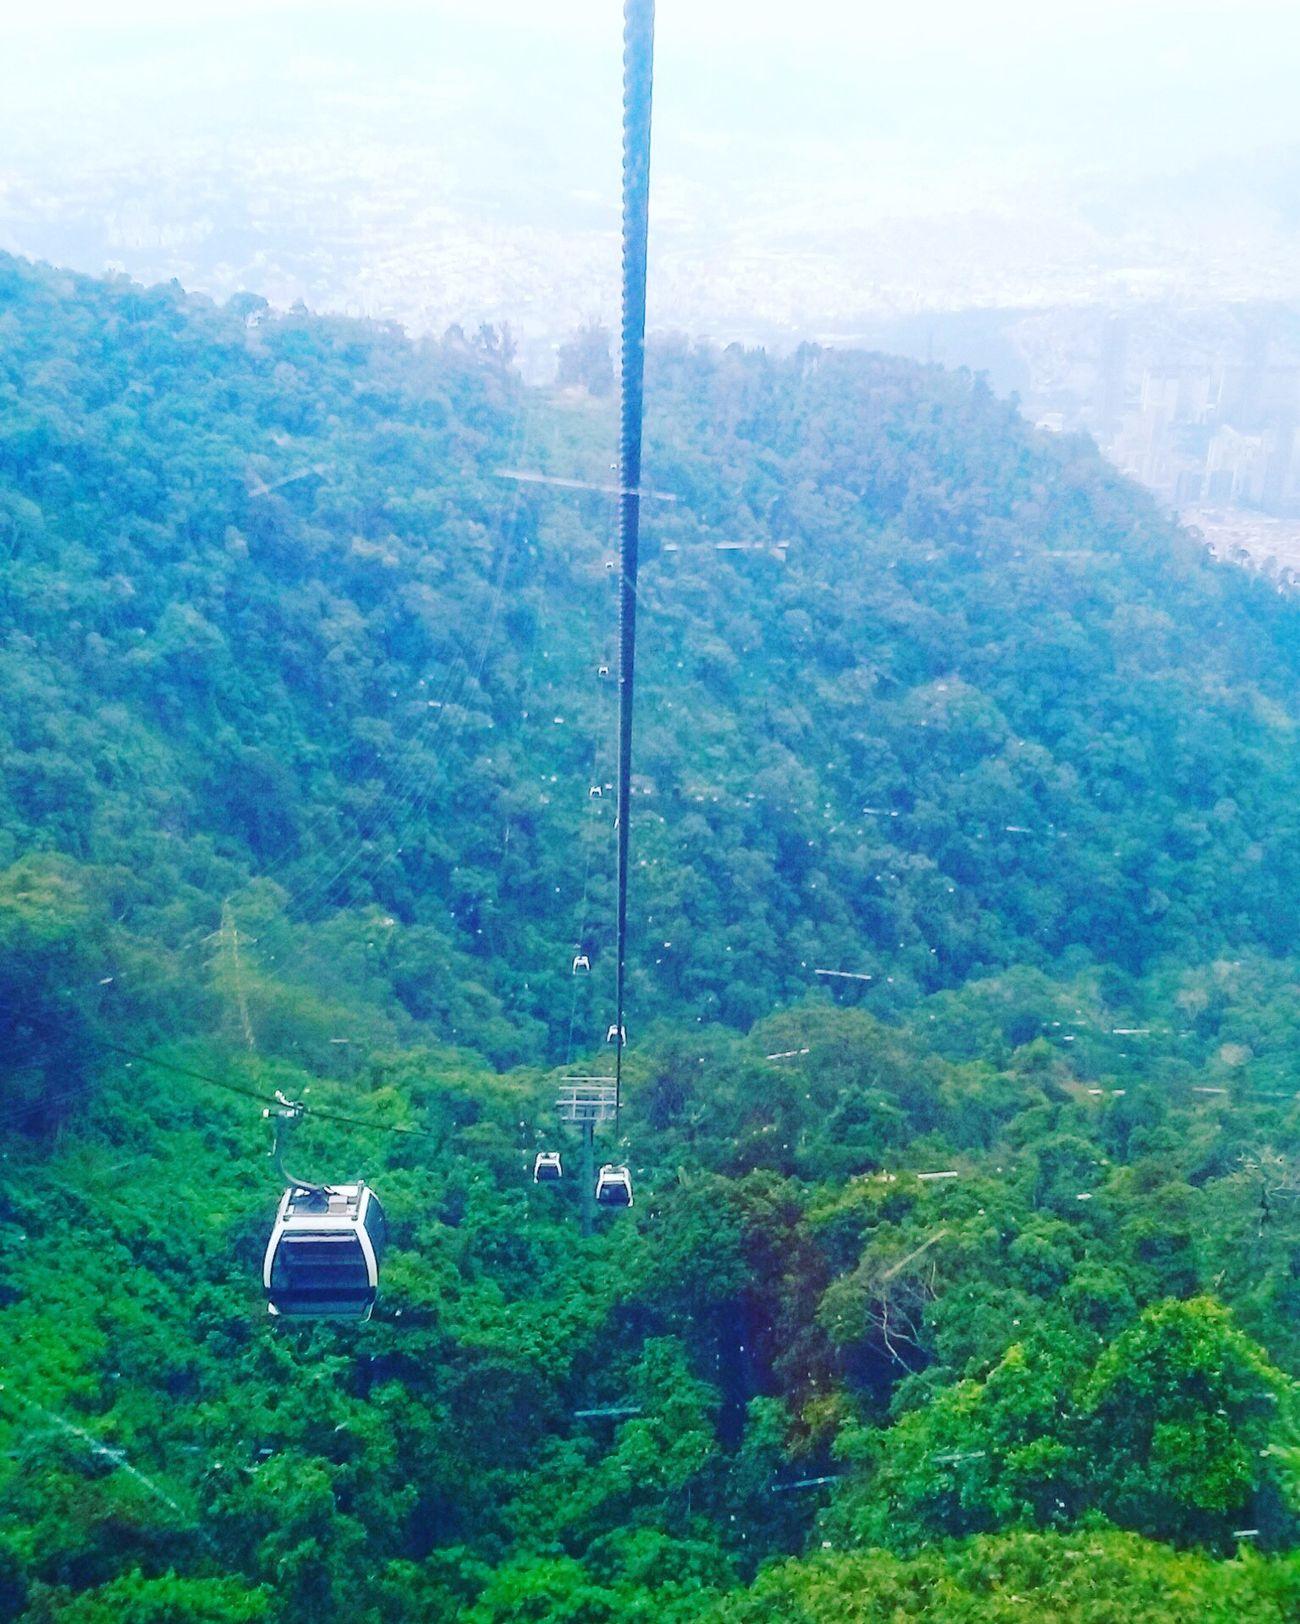 Venezuela Teleferico Warairarepano NaturalBeauty Transportation Mountain Avila Paz Belleza Word Scenics Connection Moments Plantas Vegetacion Wonderful